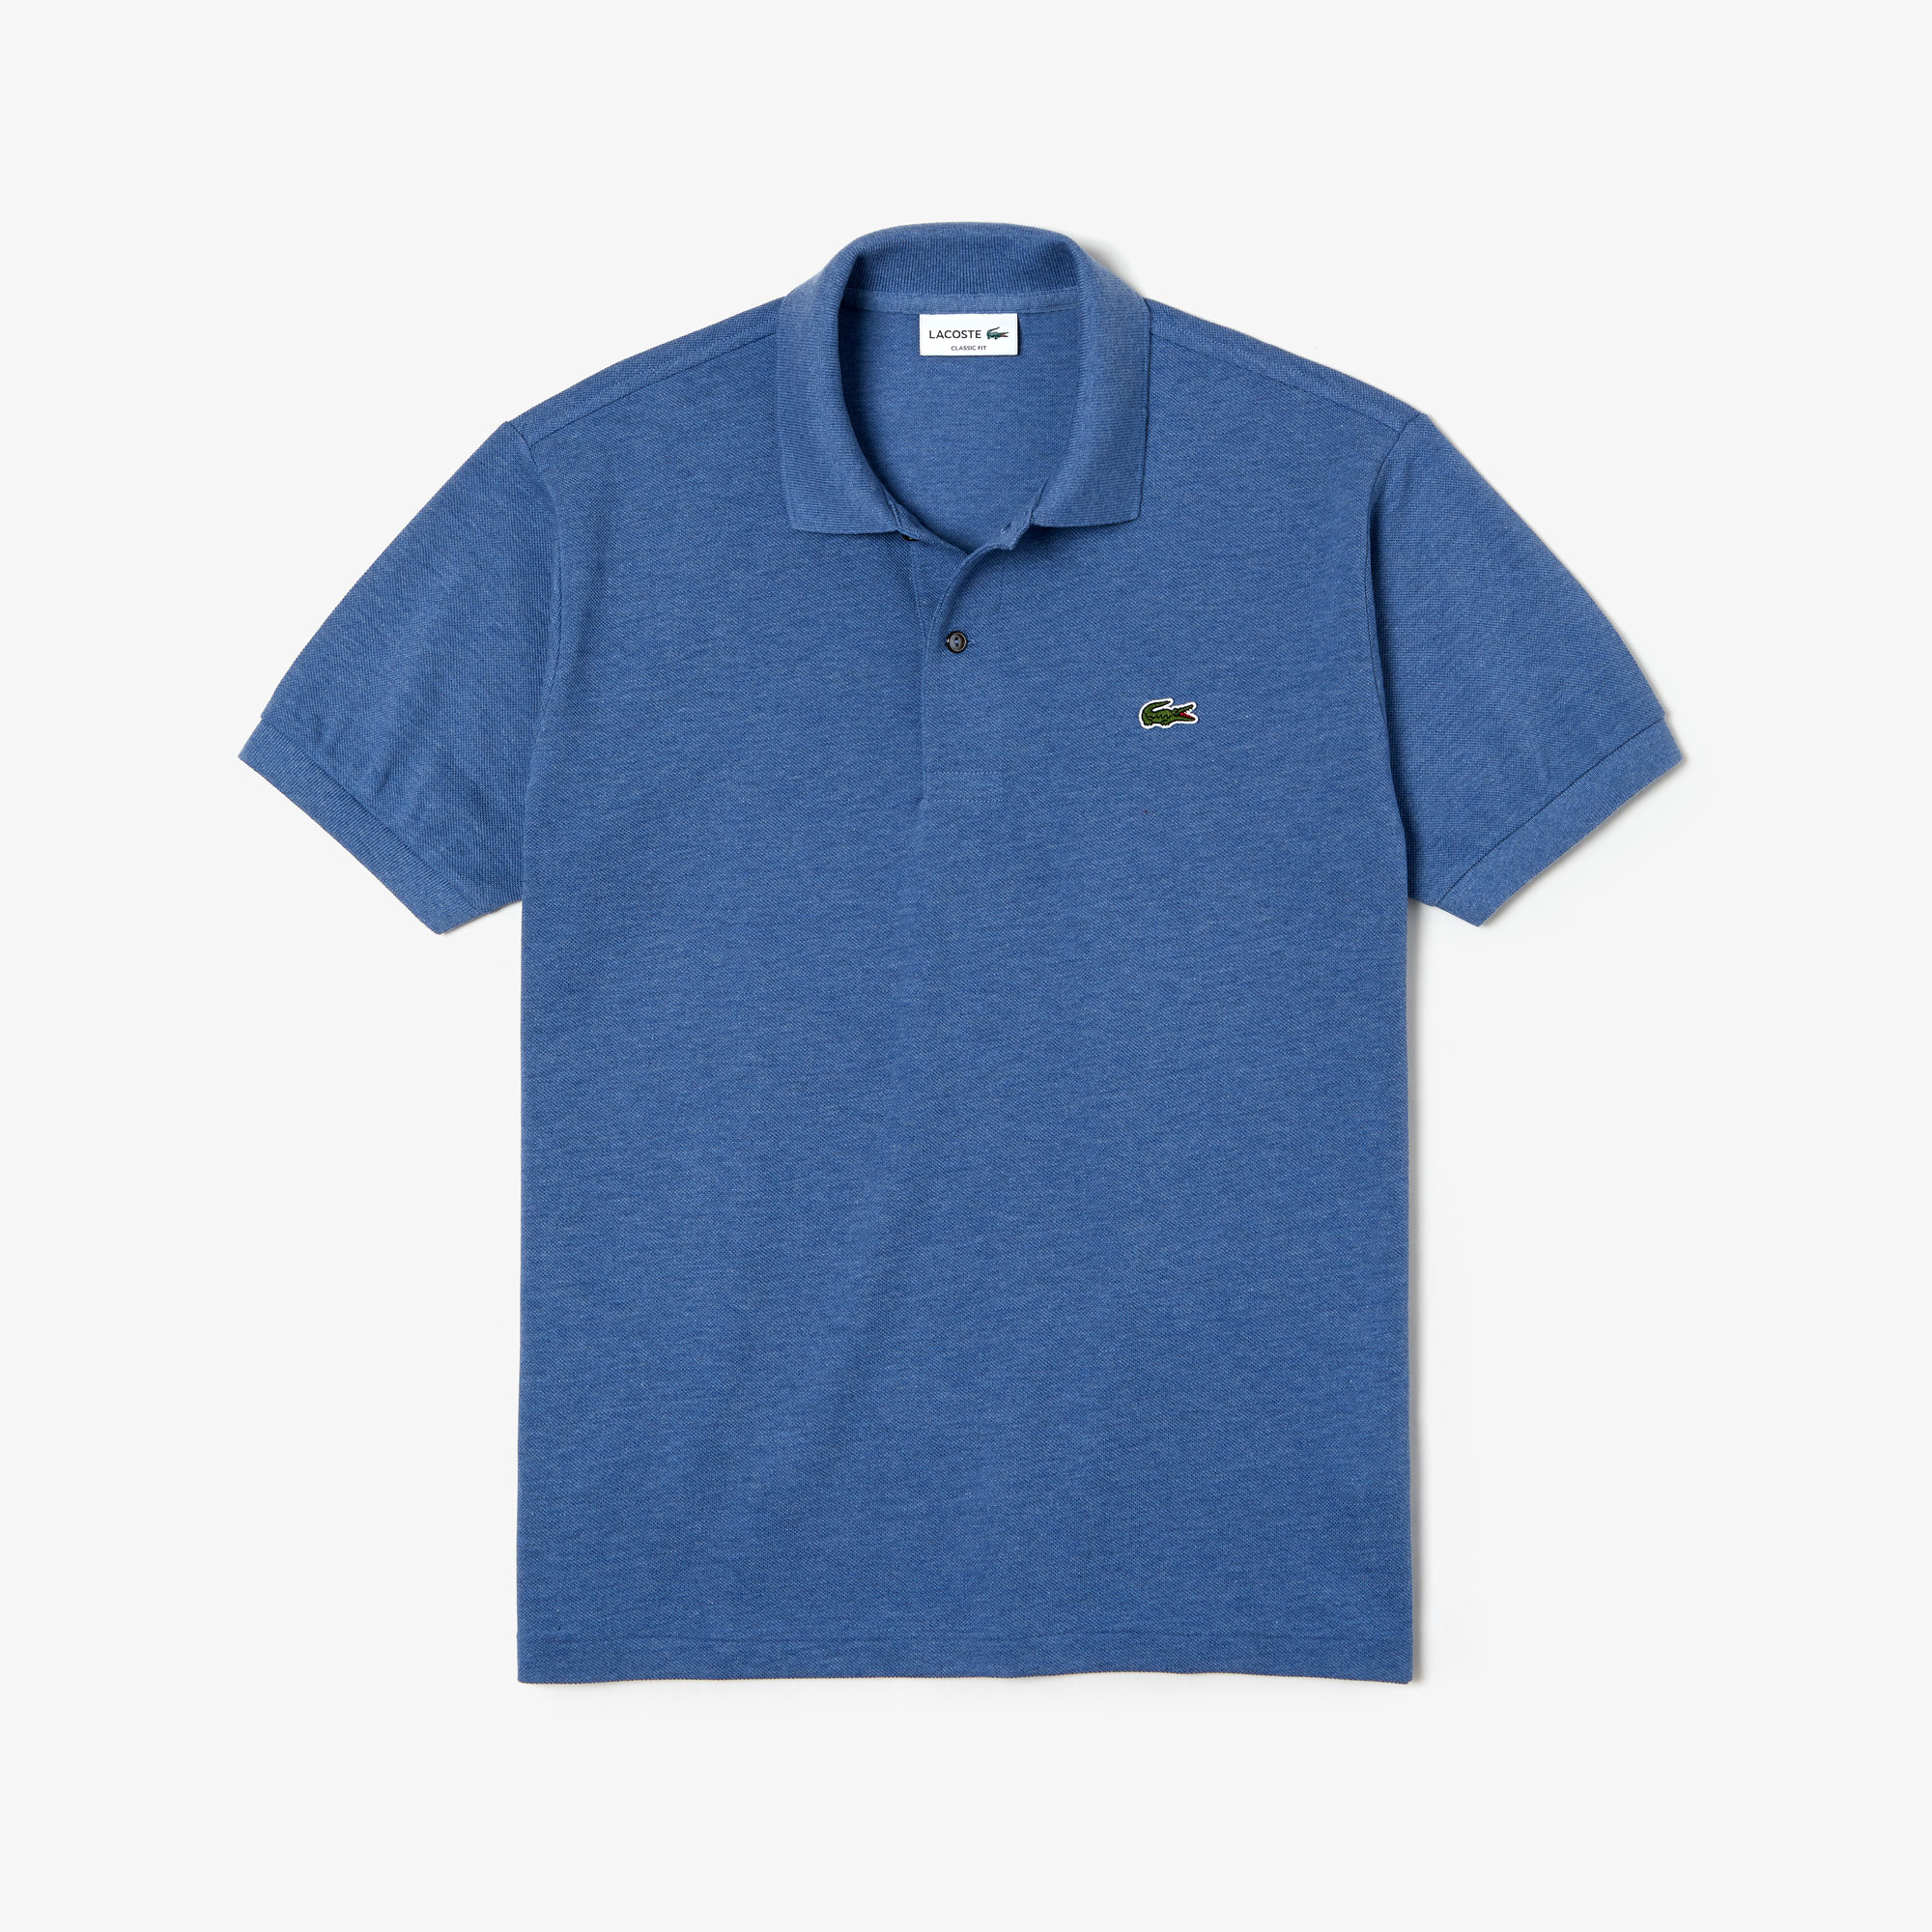 82e77694a32b2d Polos, Kleidung und Lederwaren Online | LACOSTE